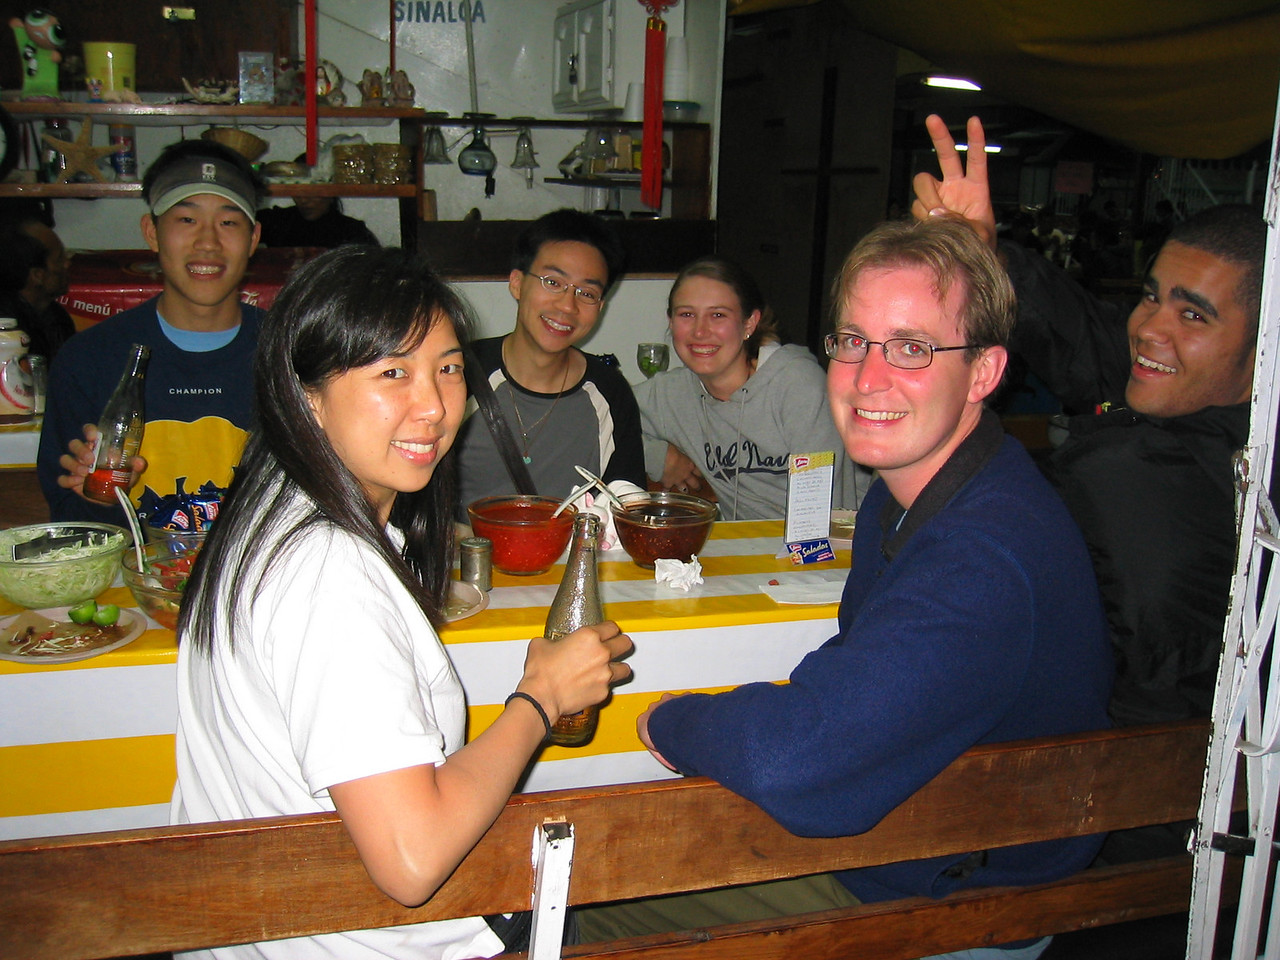 2004 05 29 Saturday - Fish tacos 2